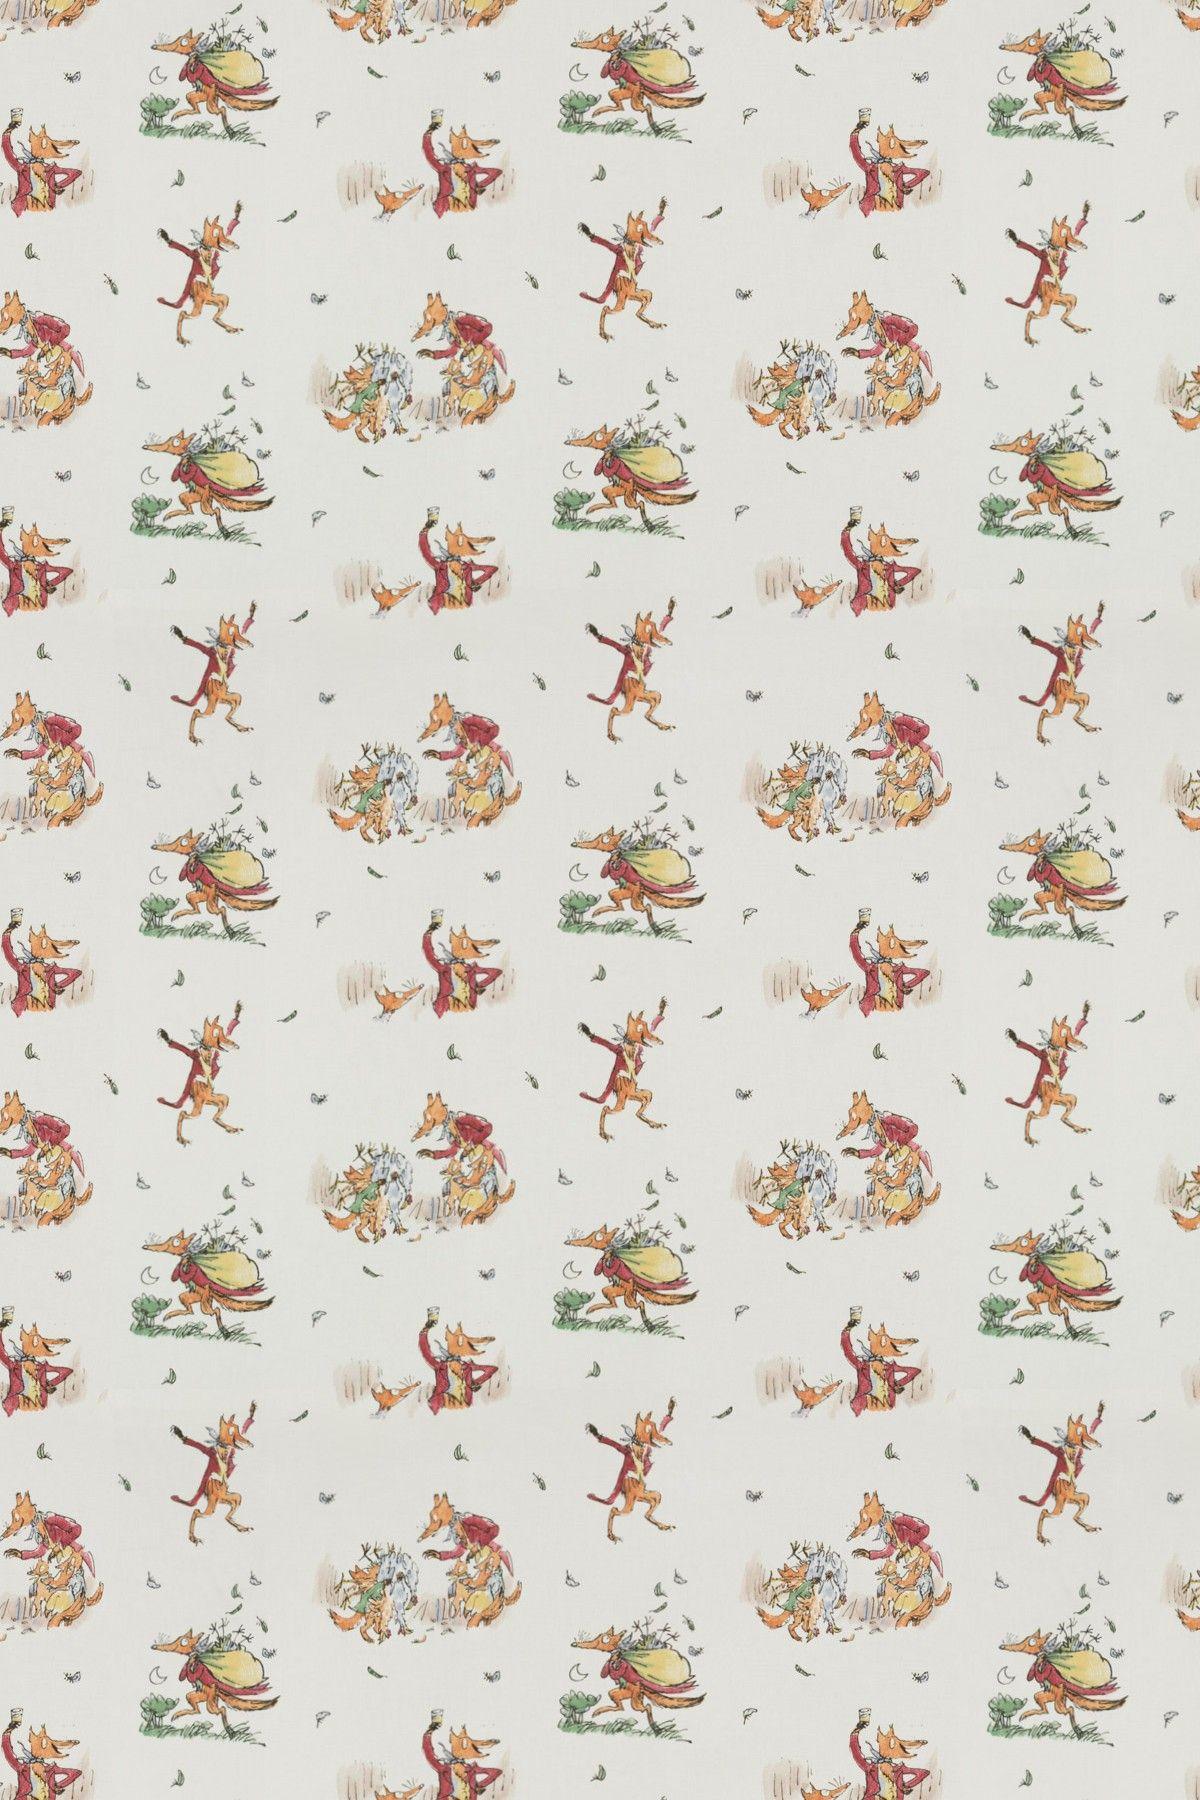 Fantastic Mr Fox By Roald Dahl Wallpaper Direct Fantastic Mr Fox Quentin Blake Illustrations Mr Fox